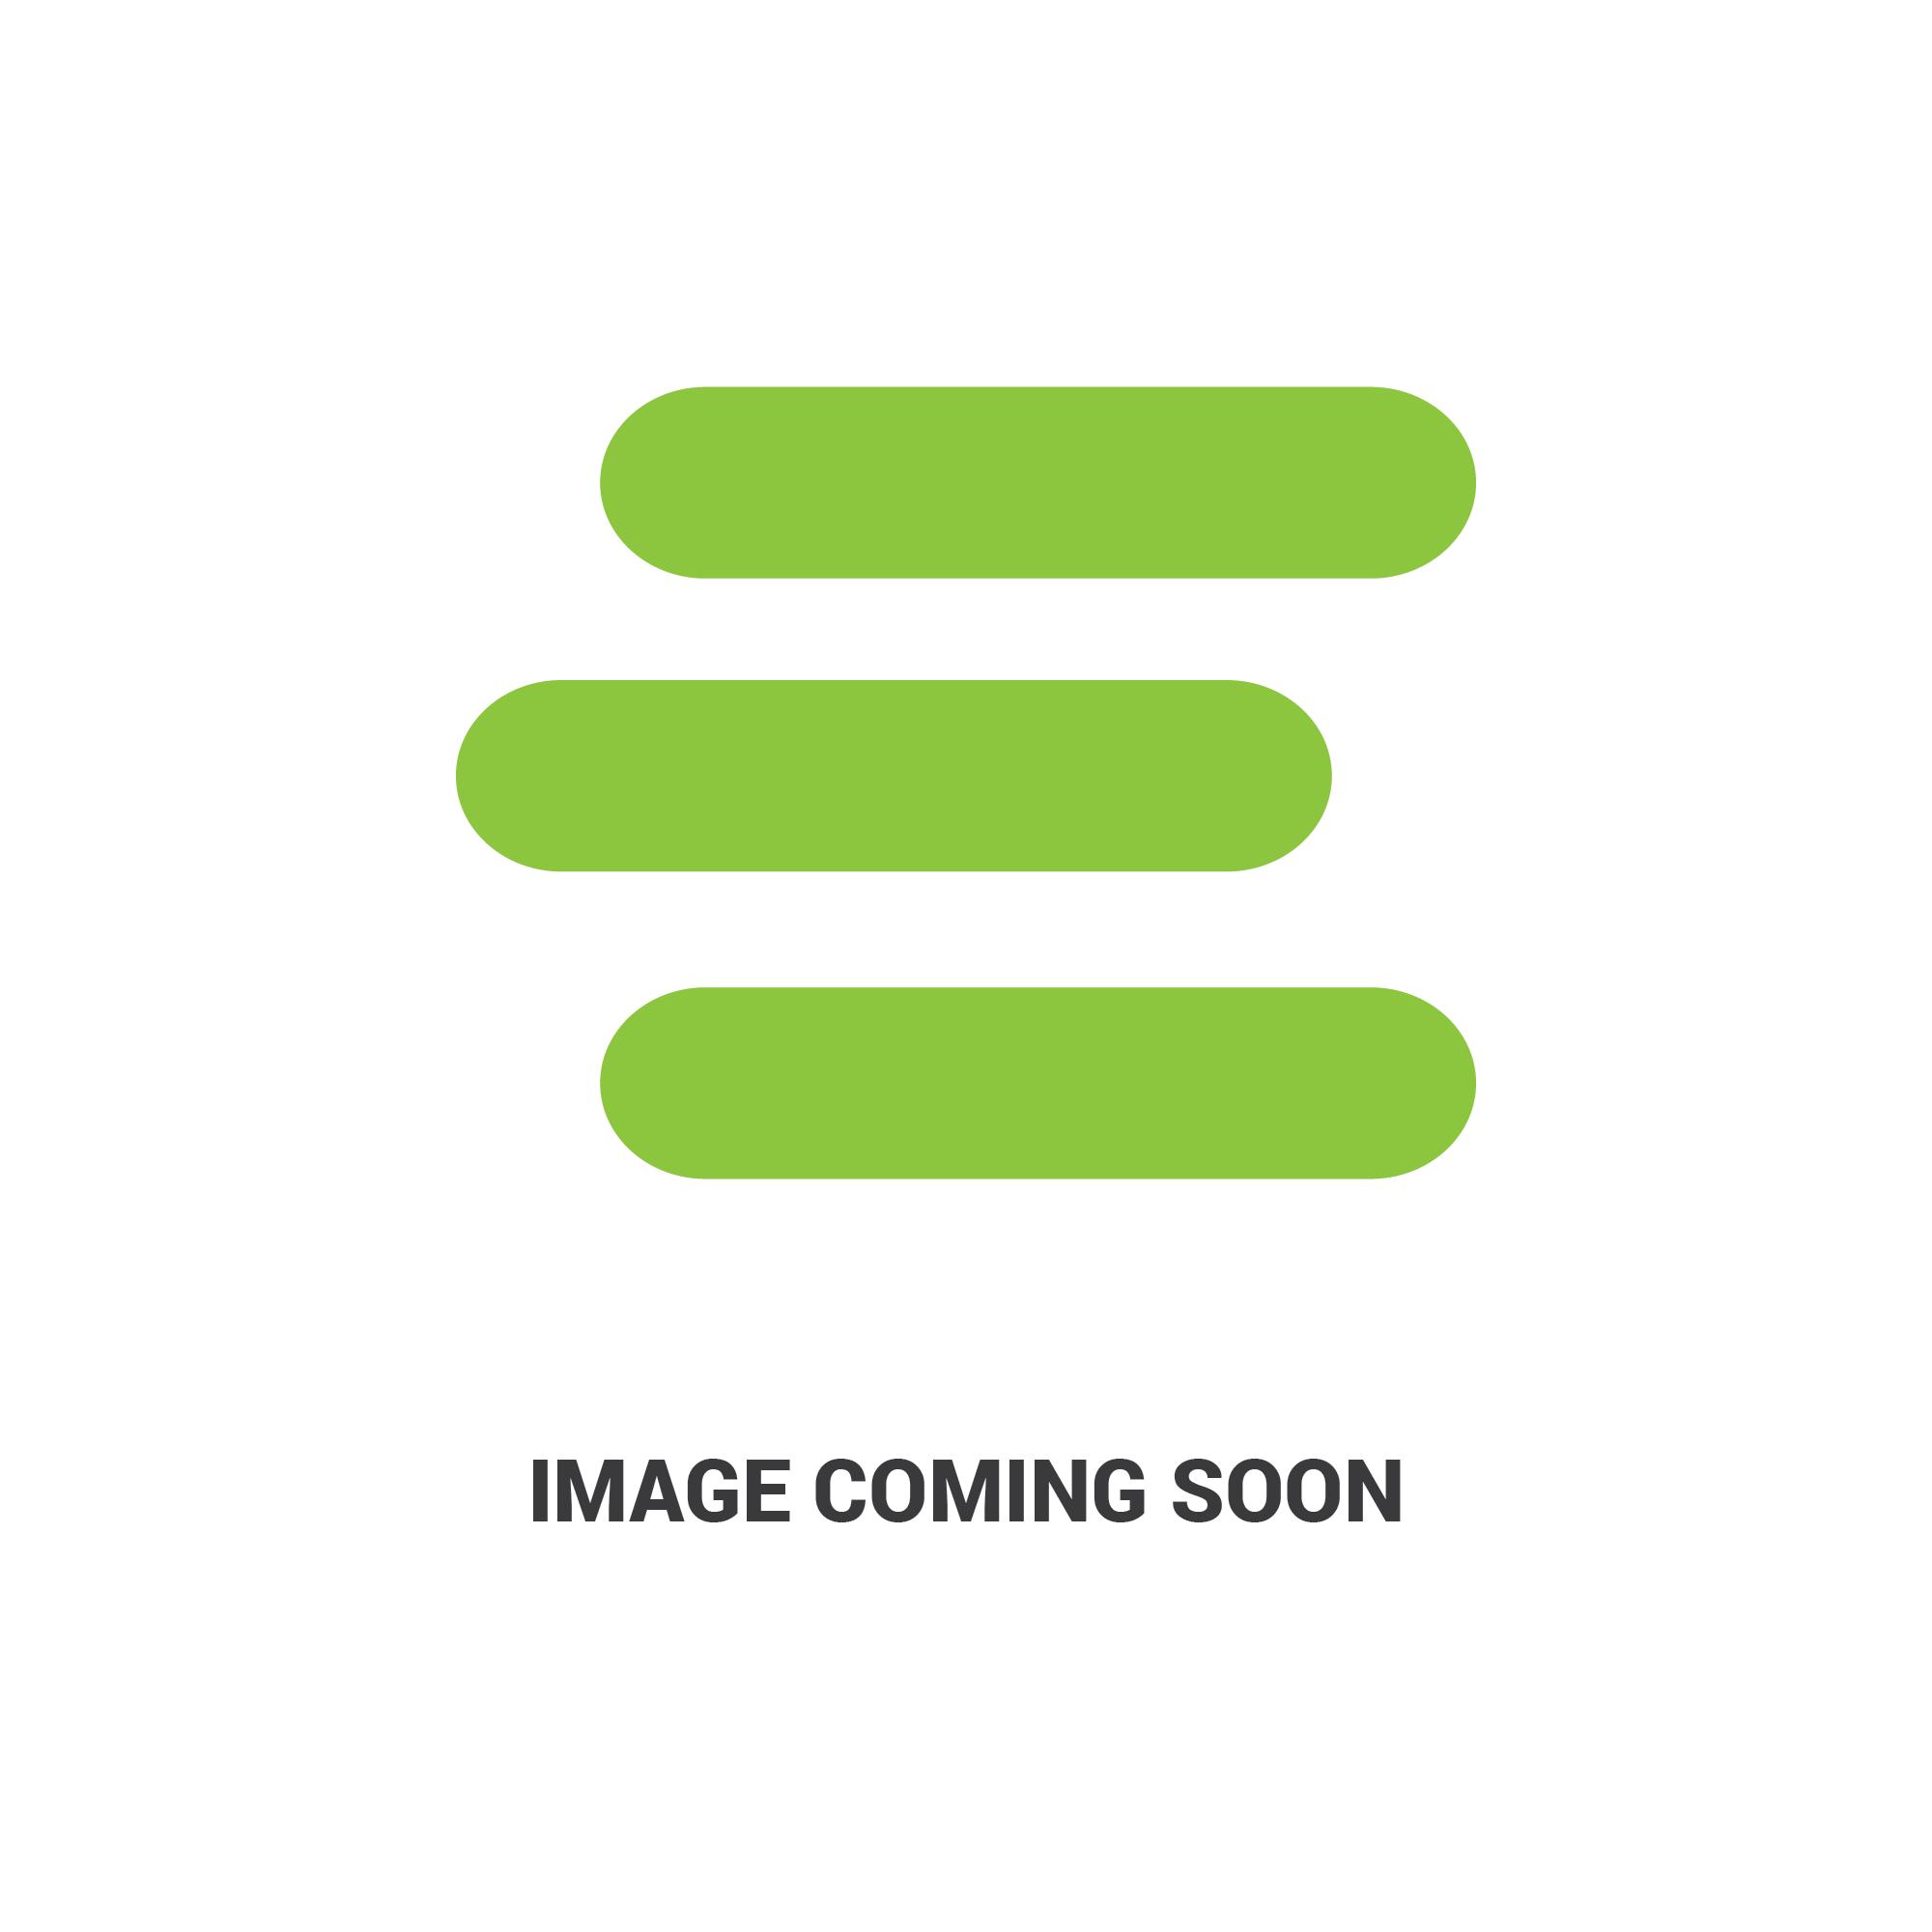 E-53066-0274-MAedit 1173.jpg